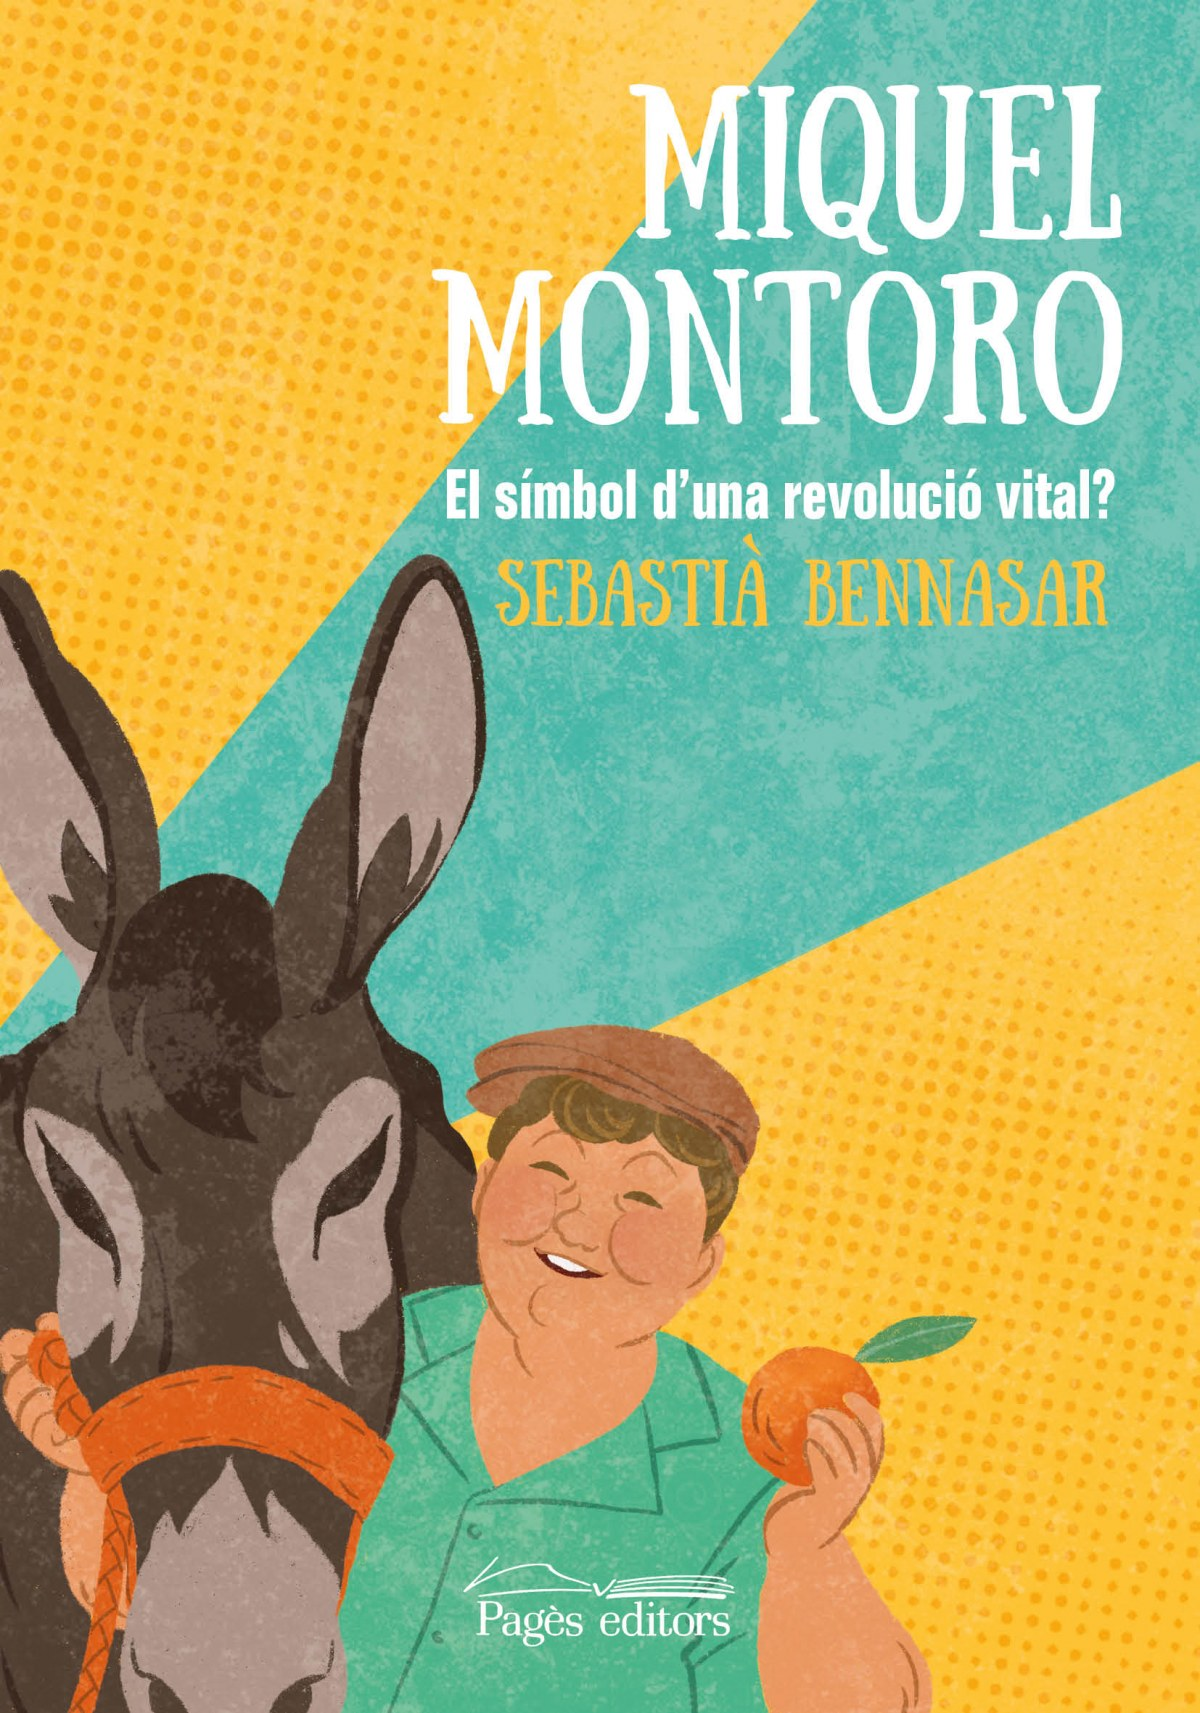 Miquel Montoro 9788413031897